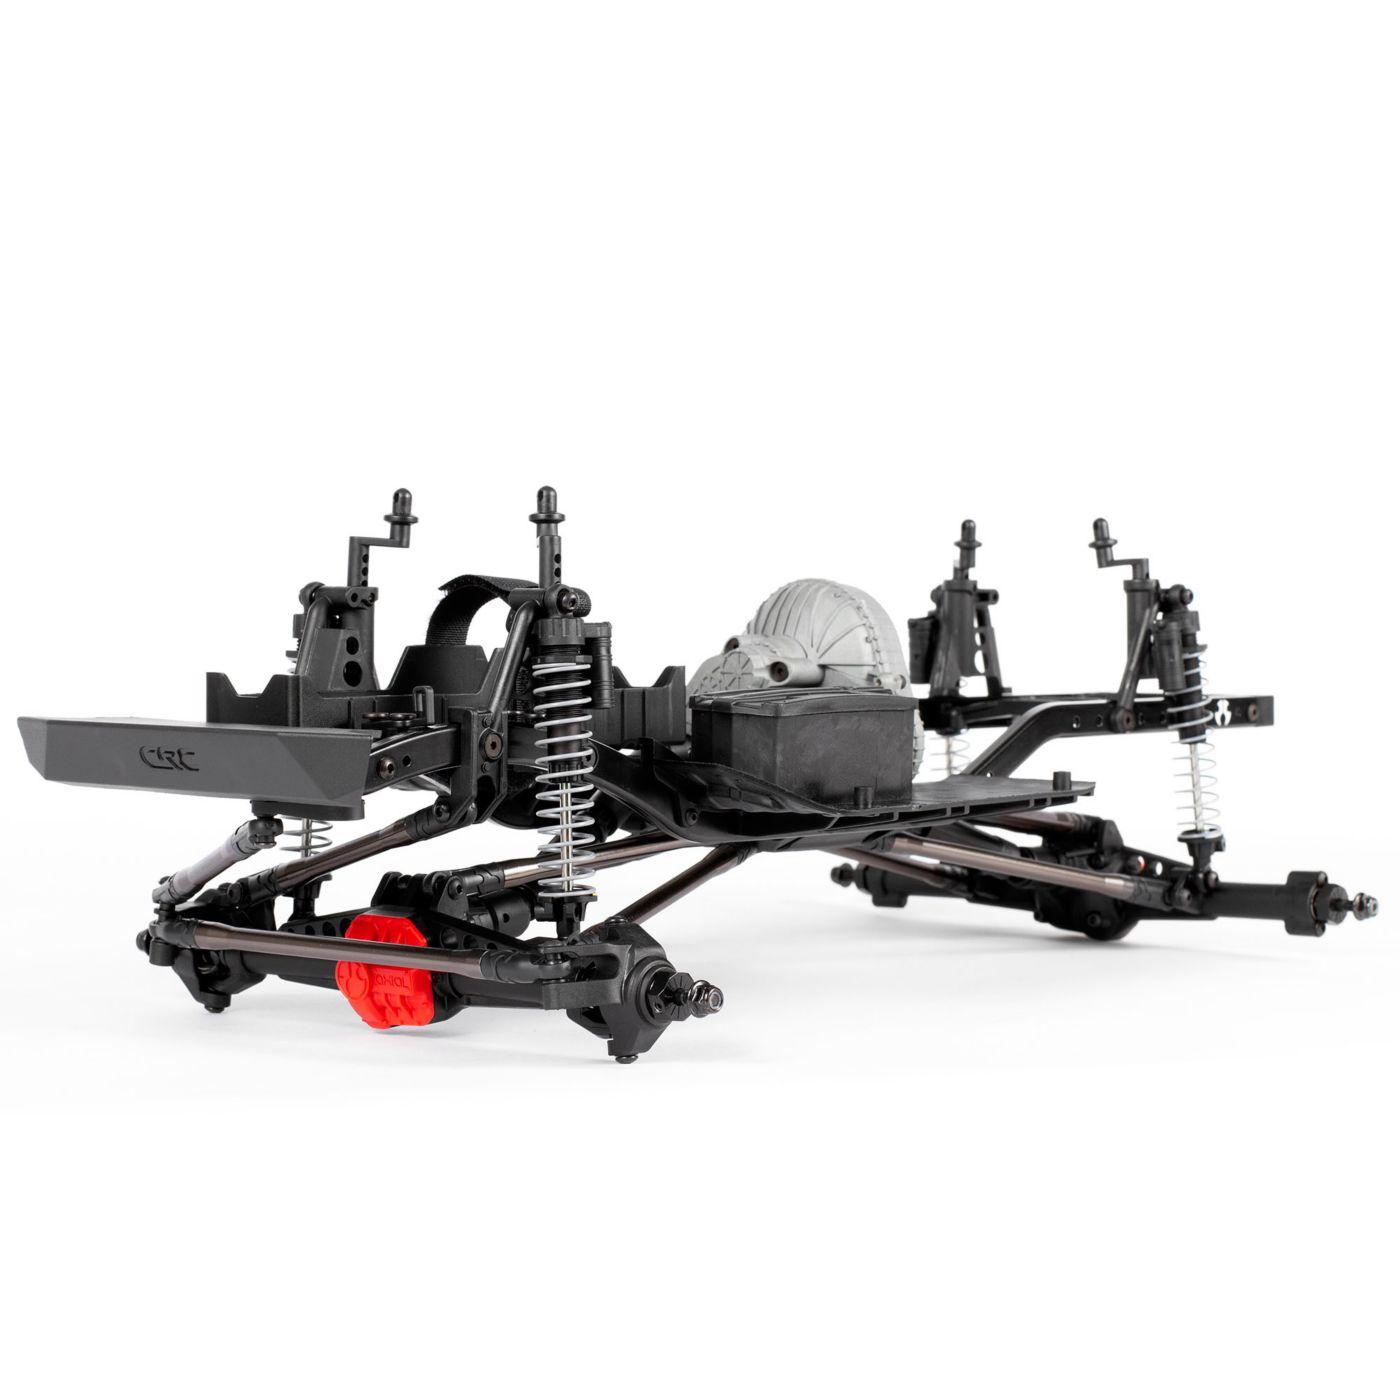 Axial Scx 10 II raw builders kit 1/10 01